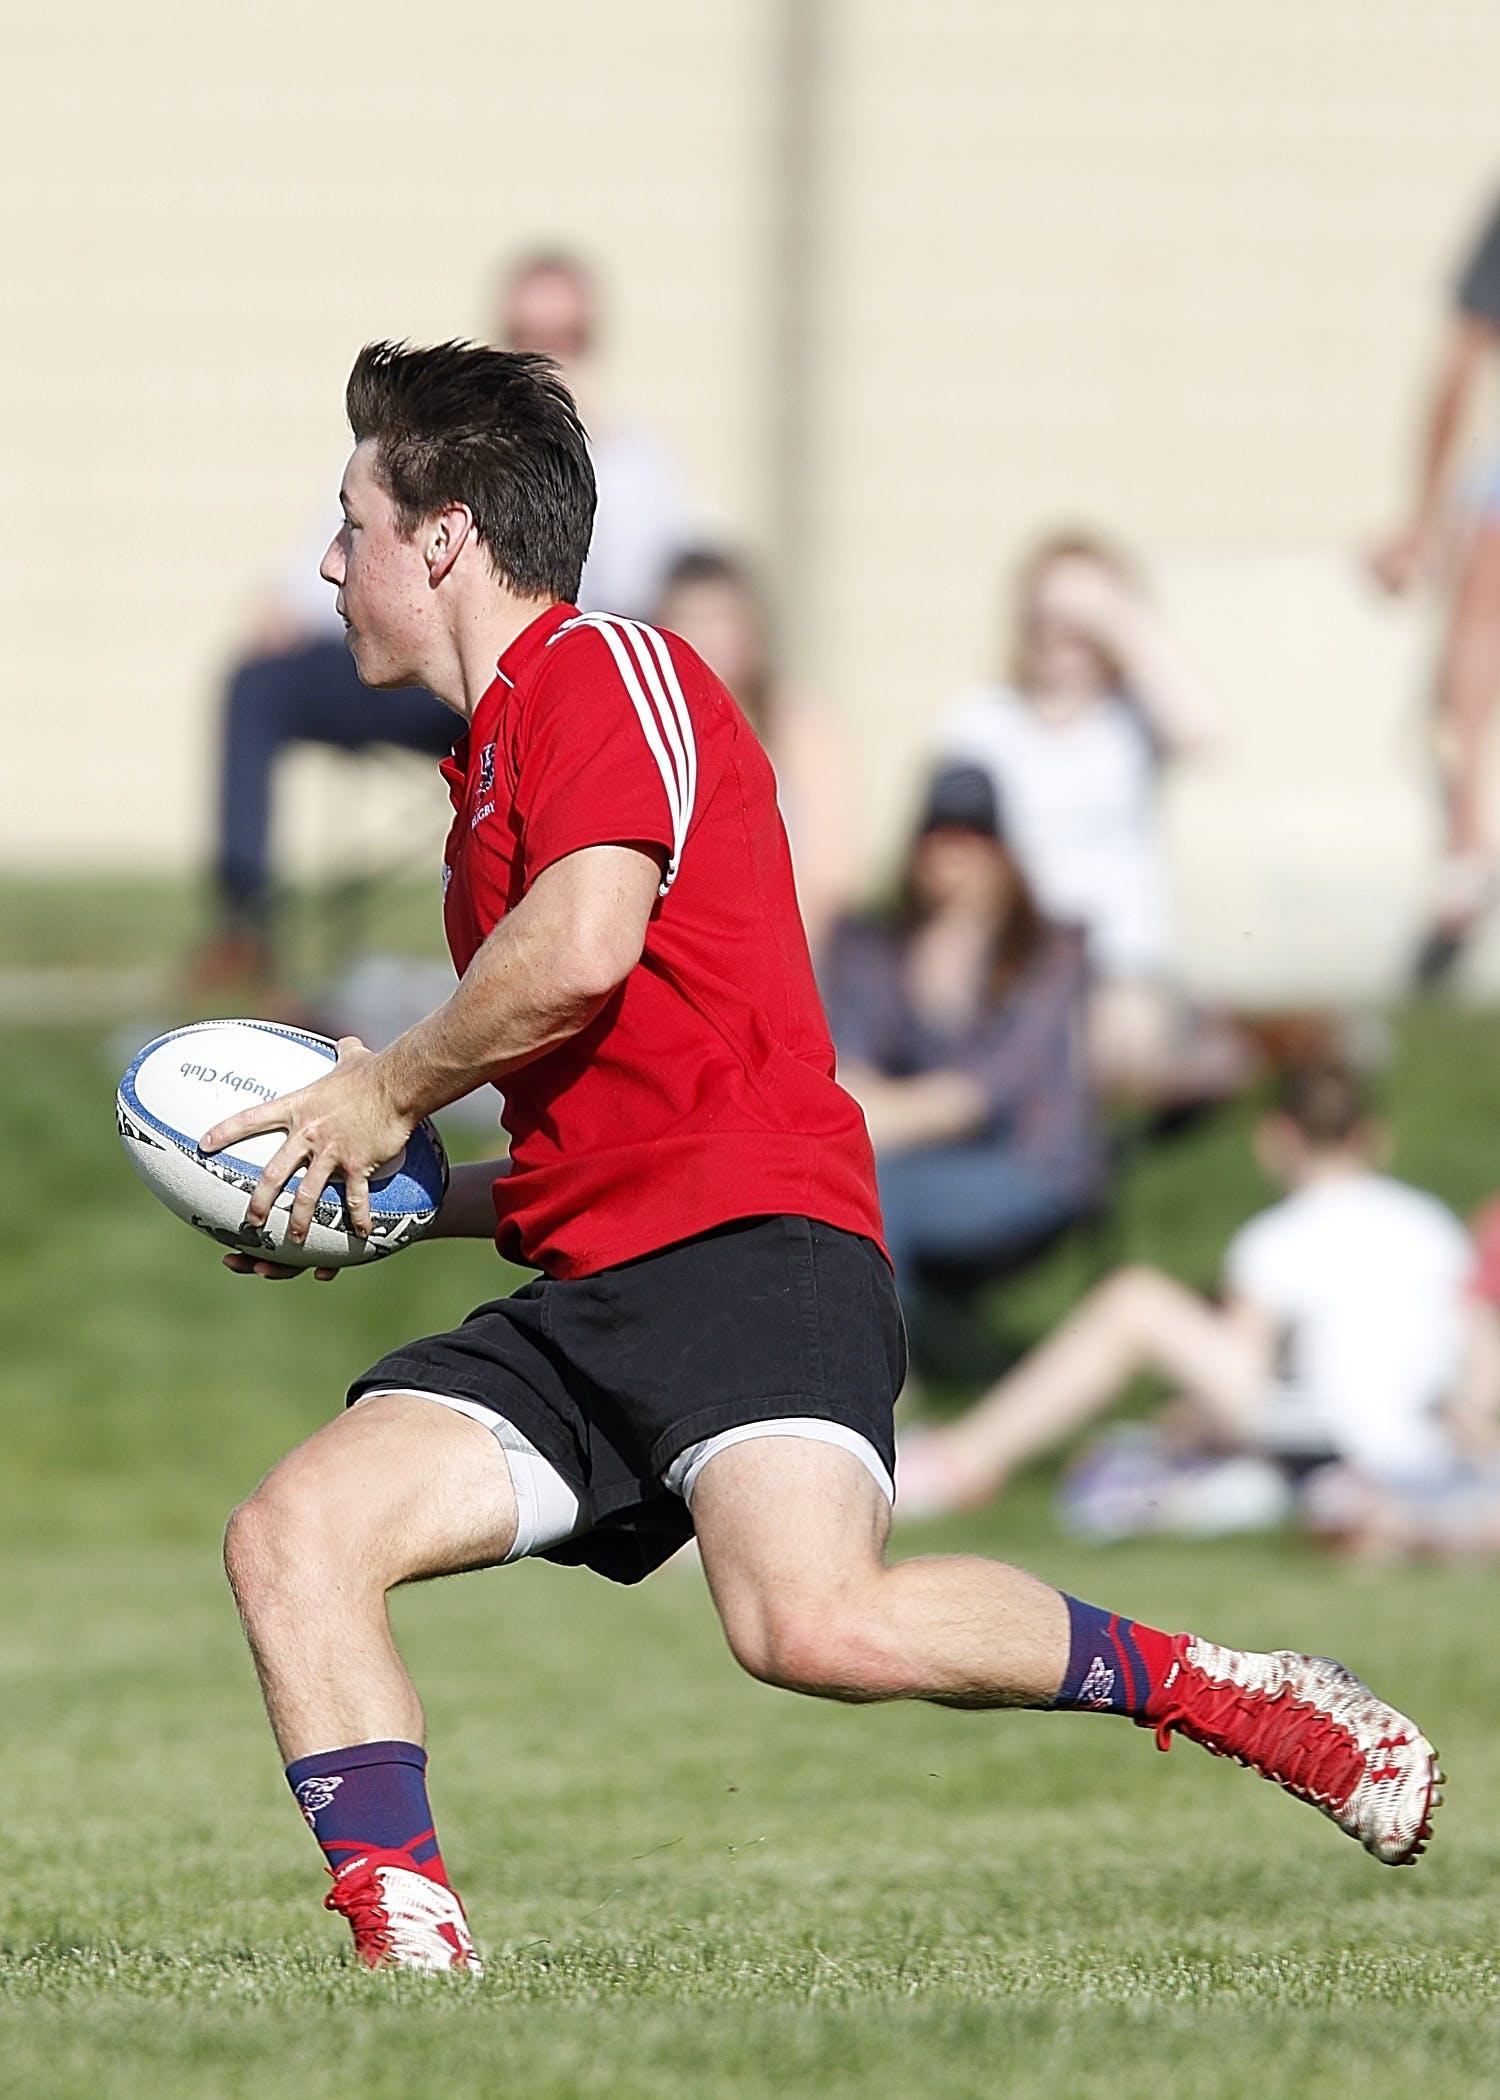 Man Playing Rugby at Daytime